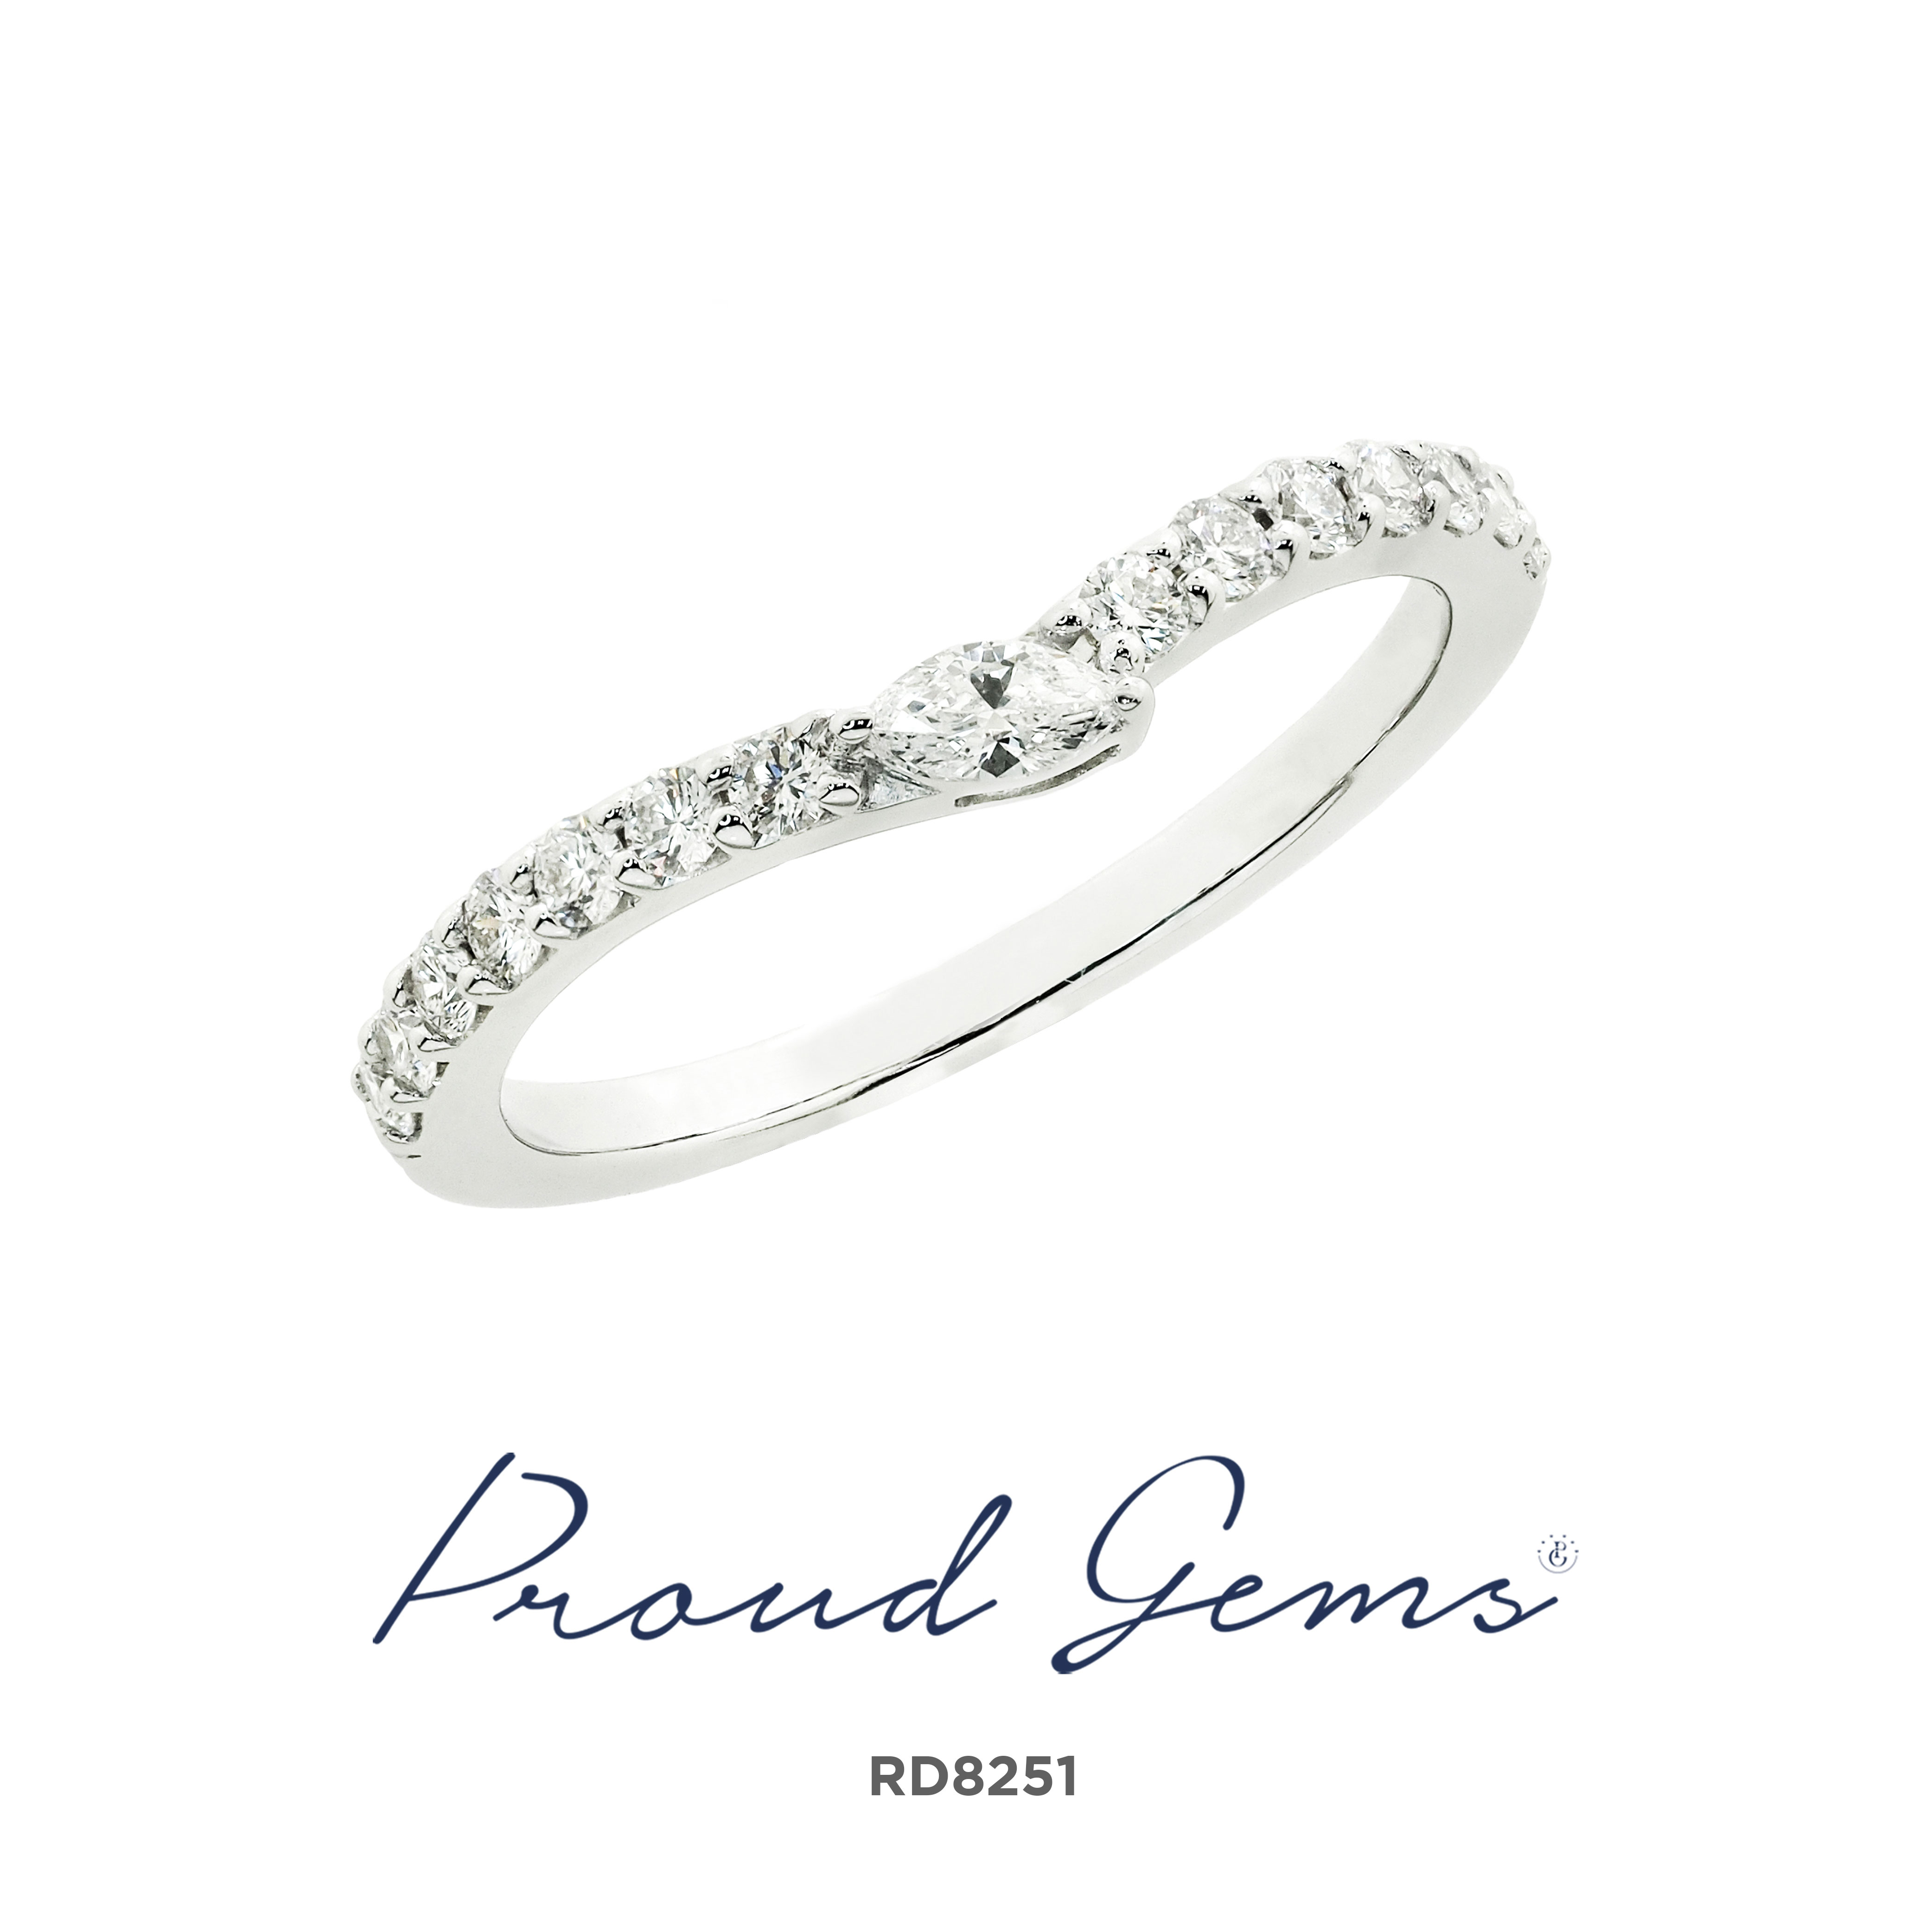 8251RD W 300x300 - แหวนเพชร  RD8251